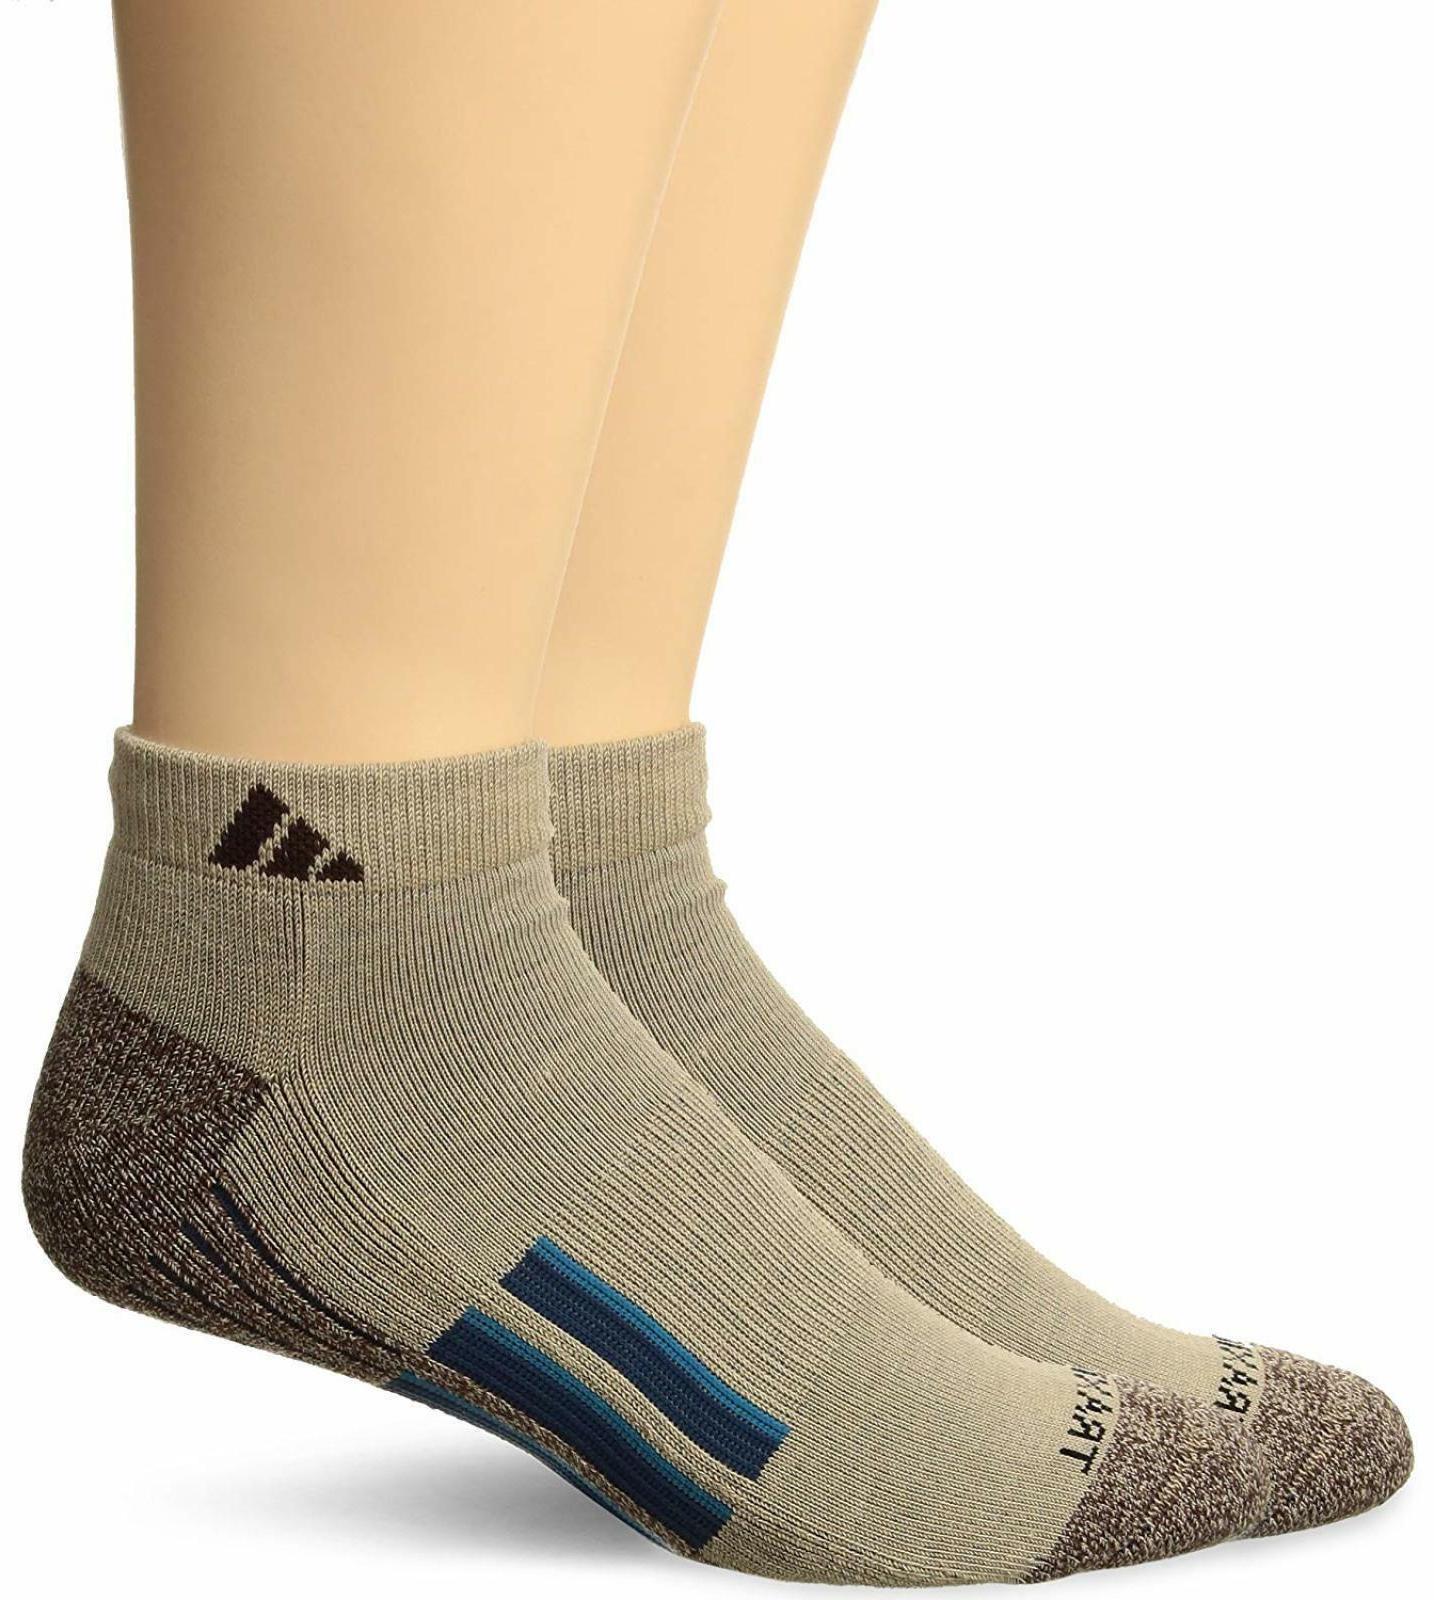 103863 Adidas Mens Climalite X II Low Cut Socks 2 Pack